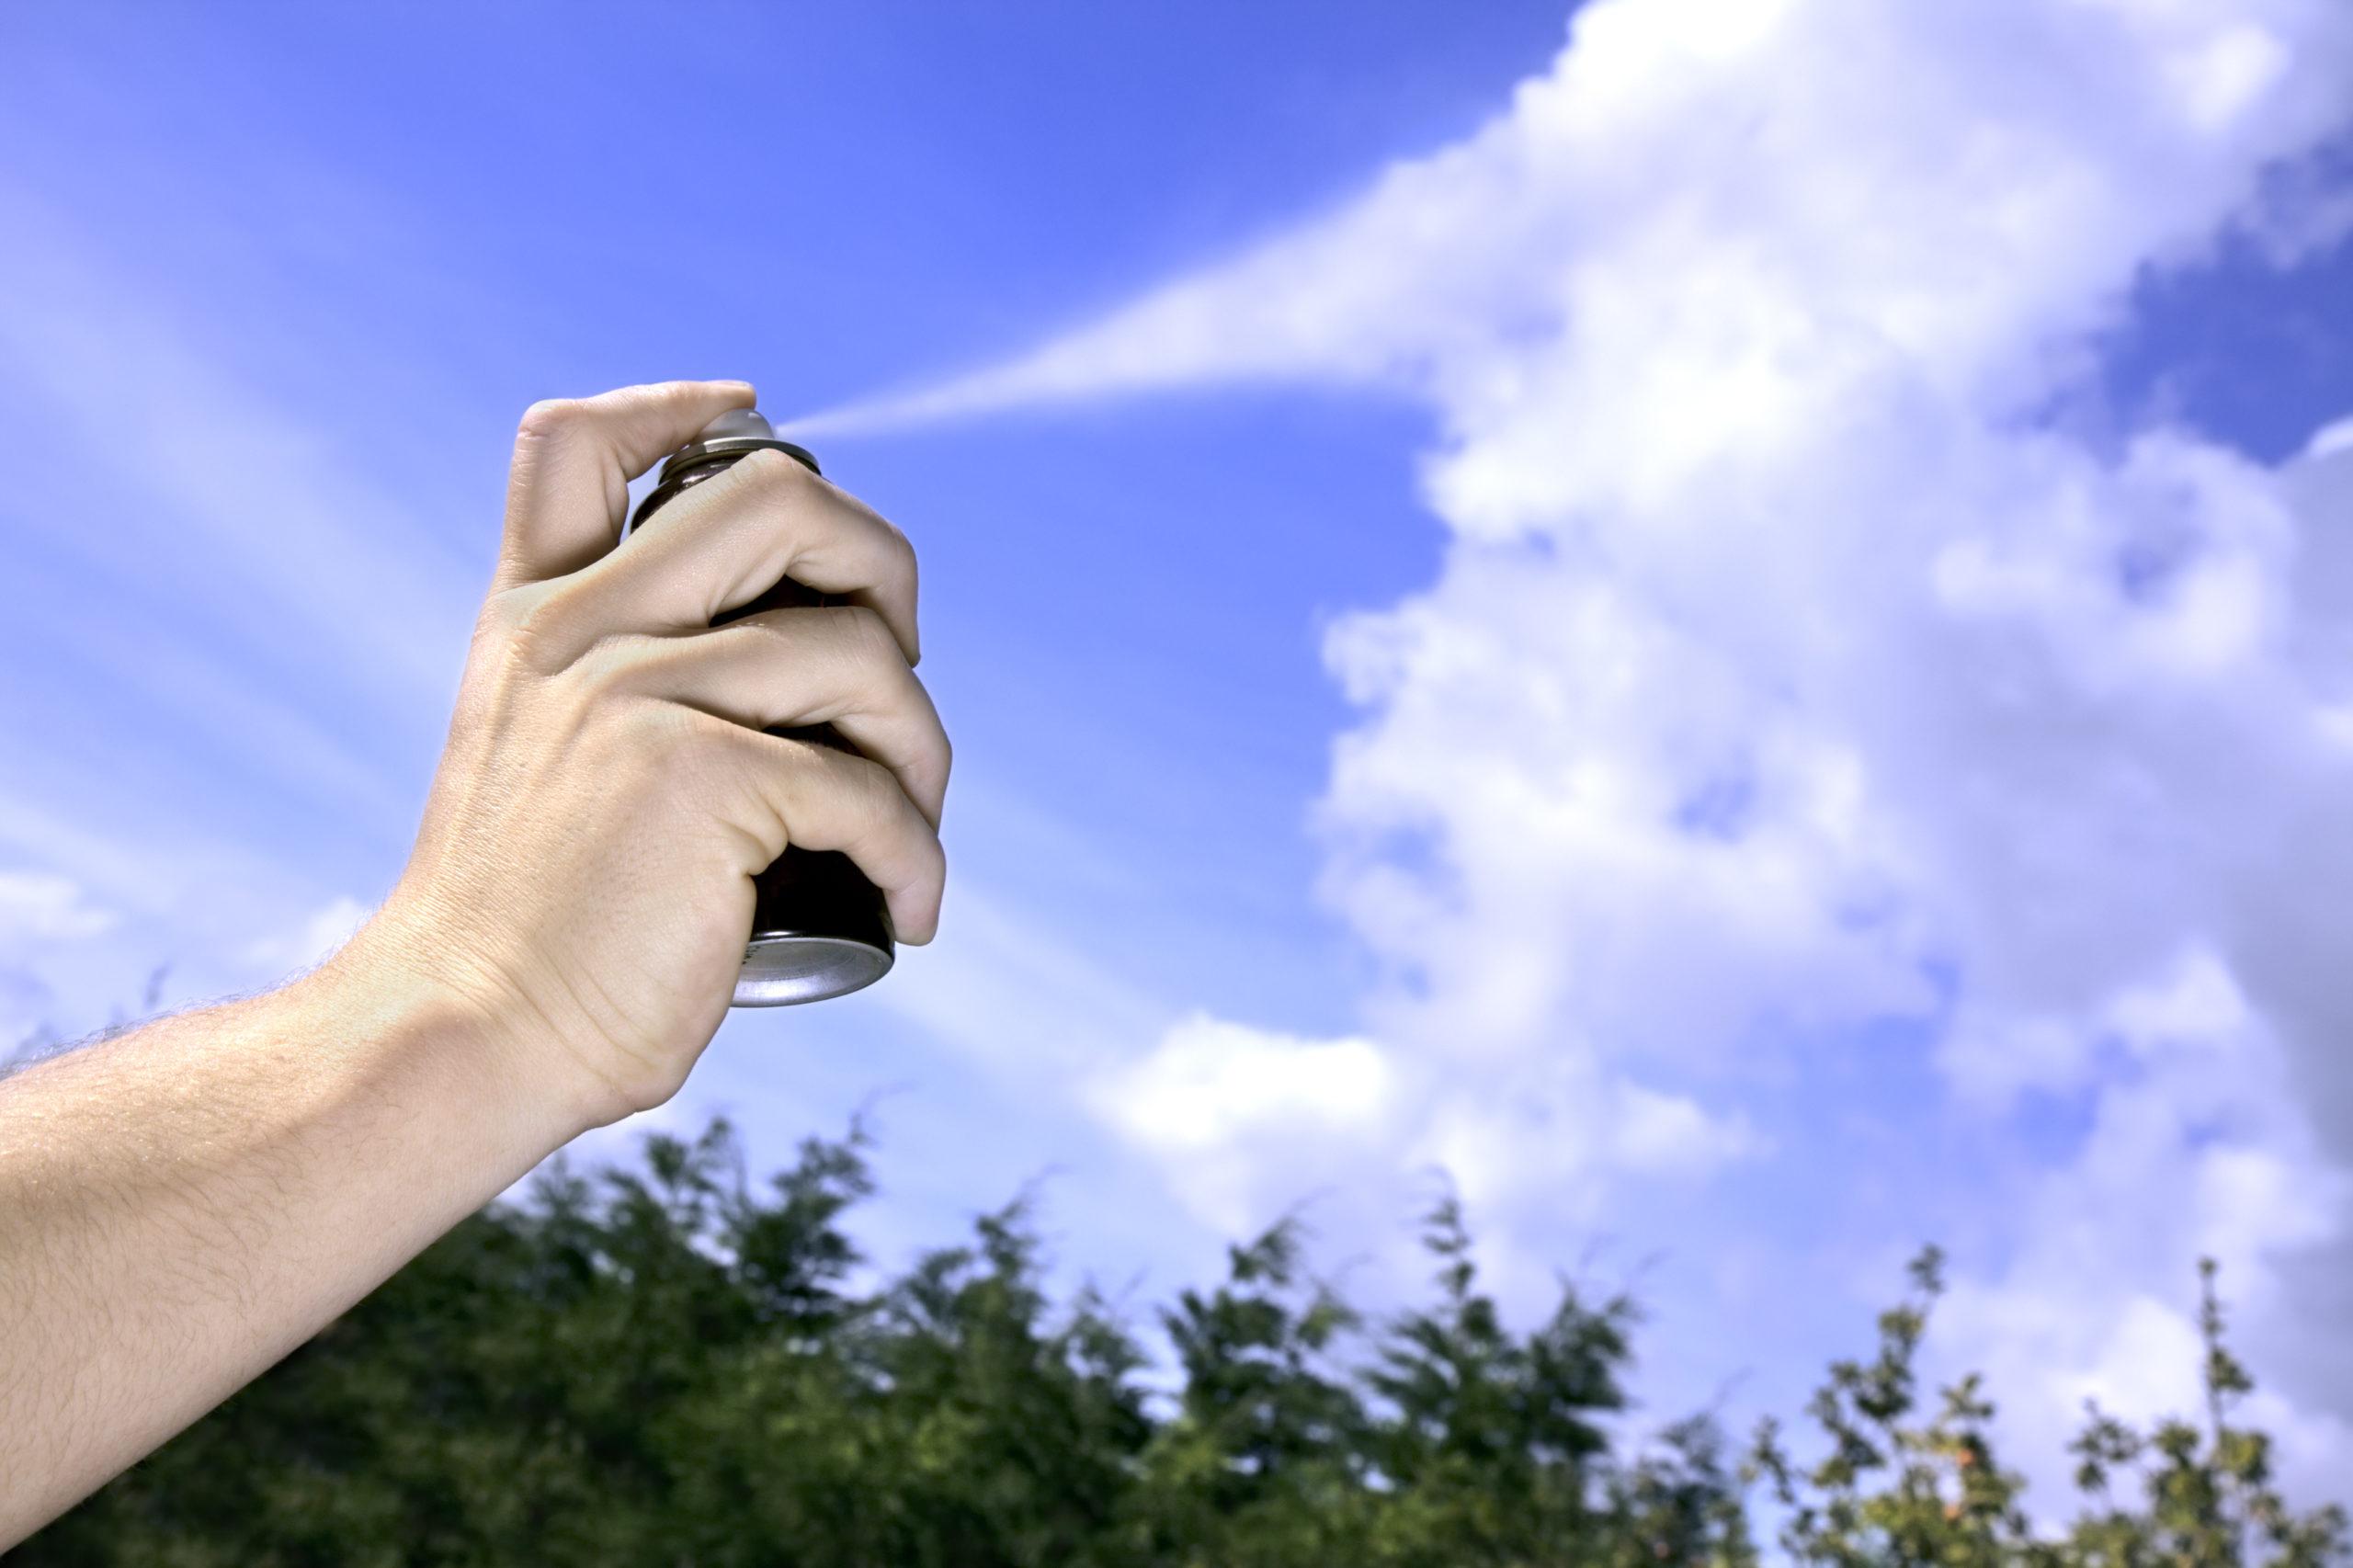 A person spraying aerosol into the air.